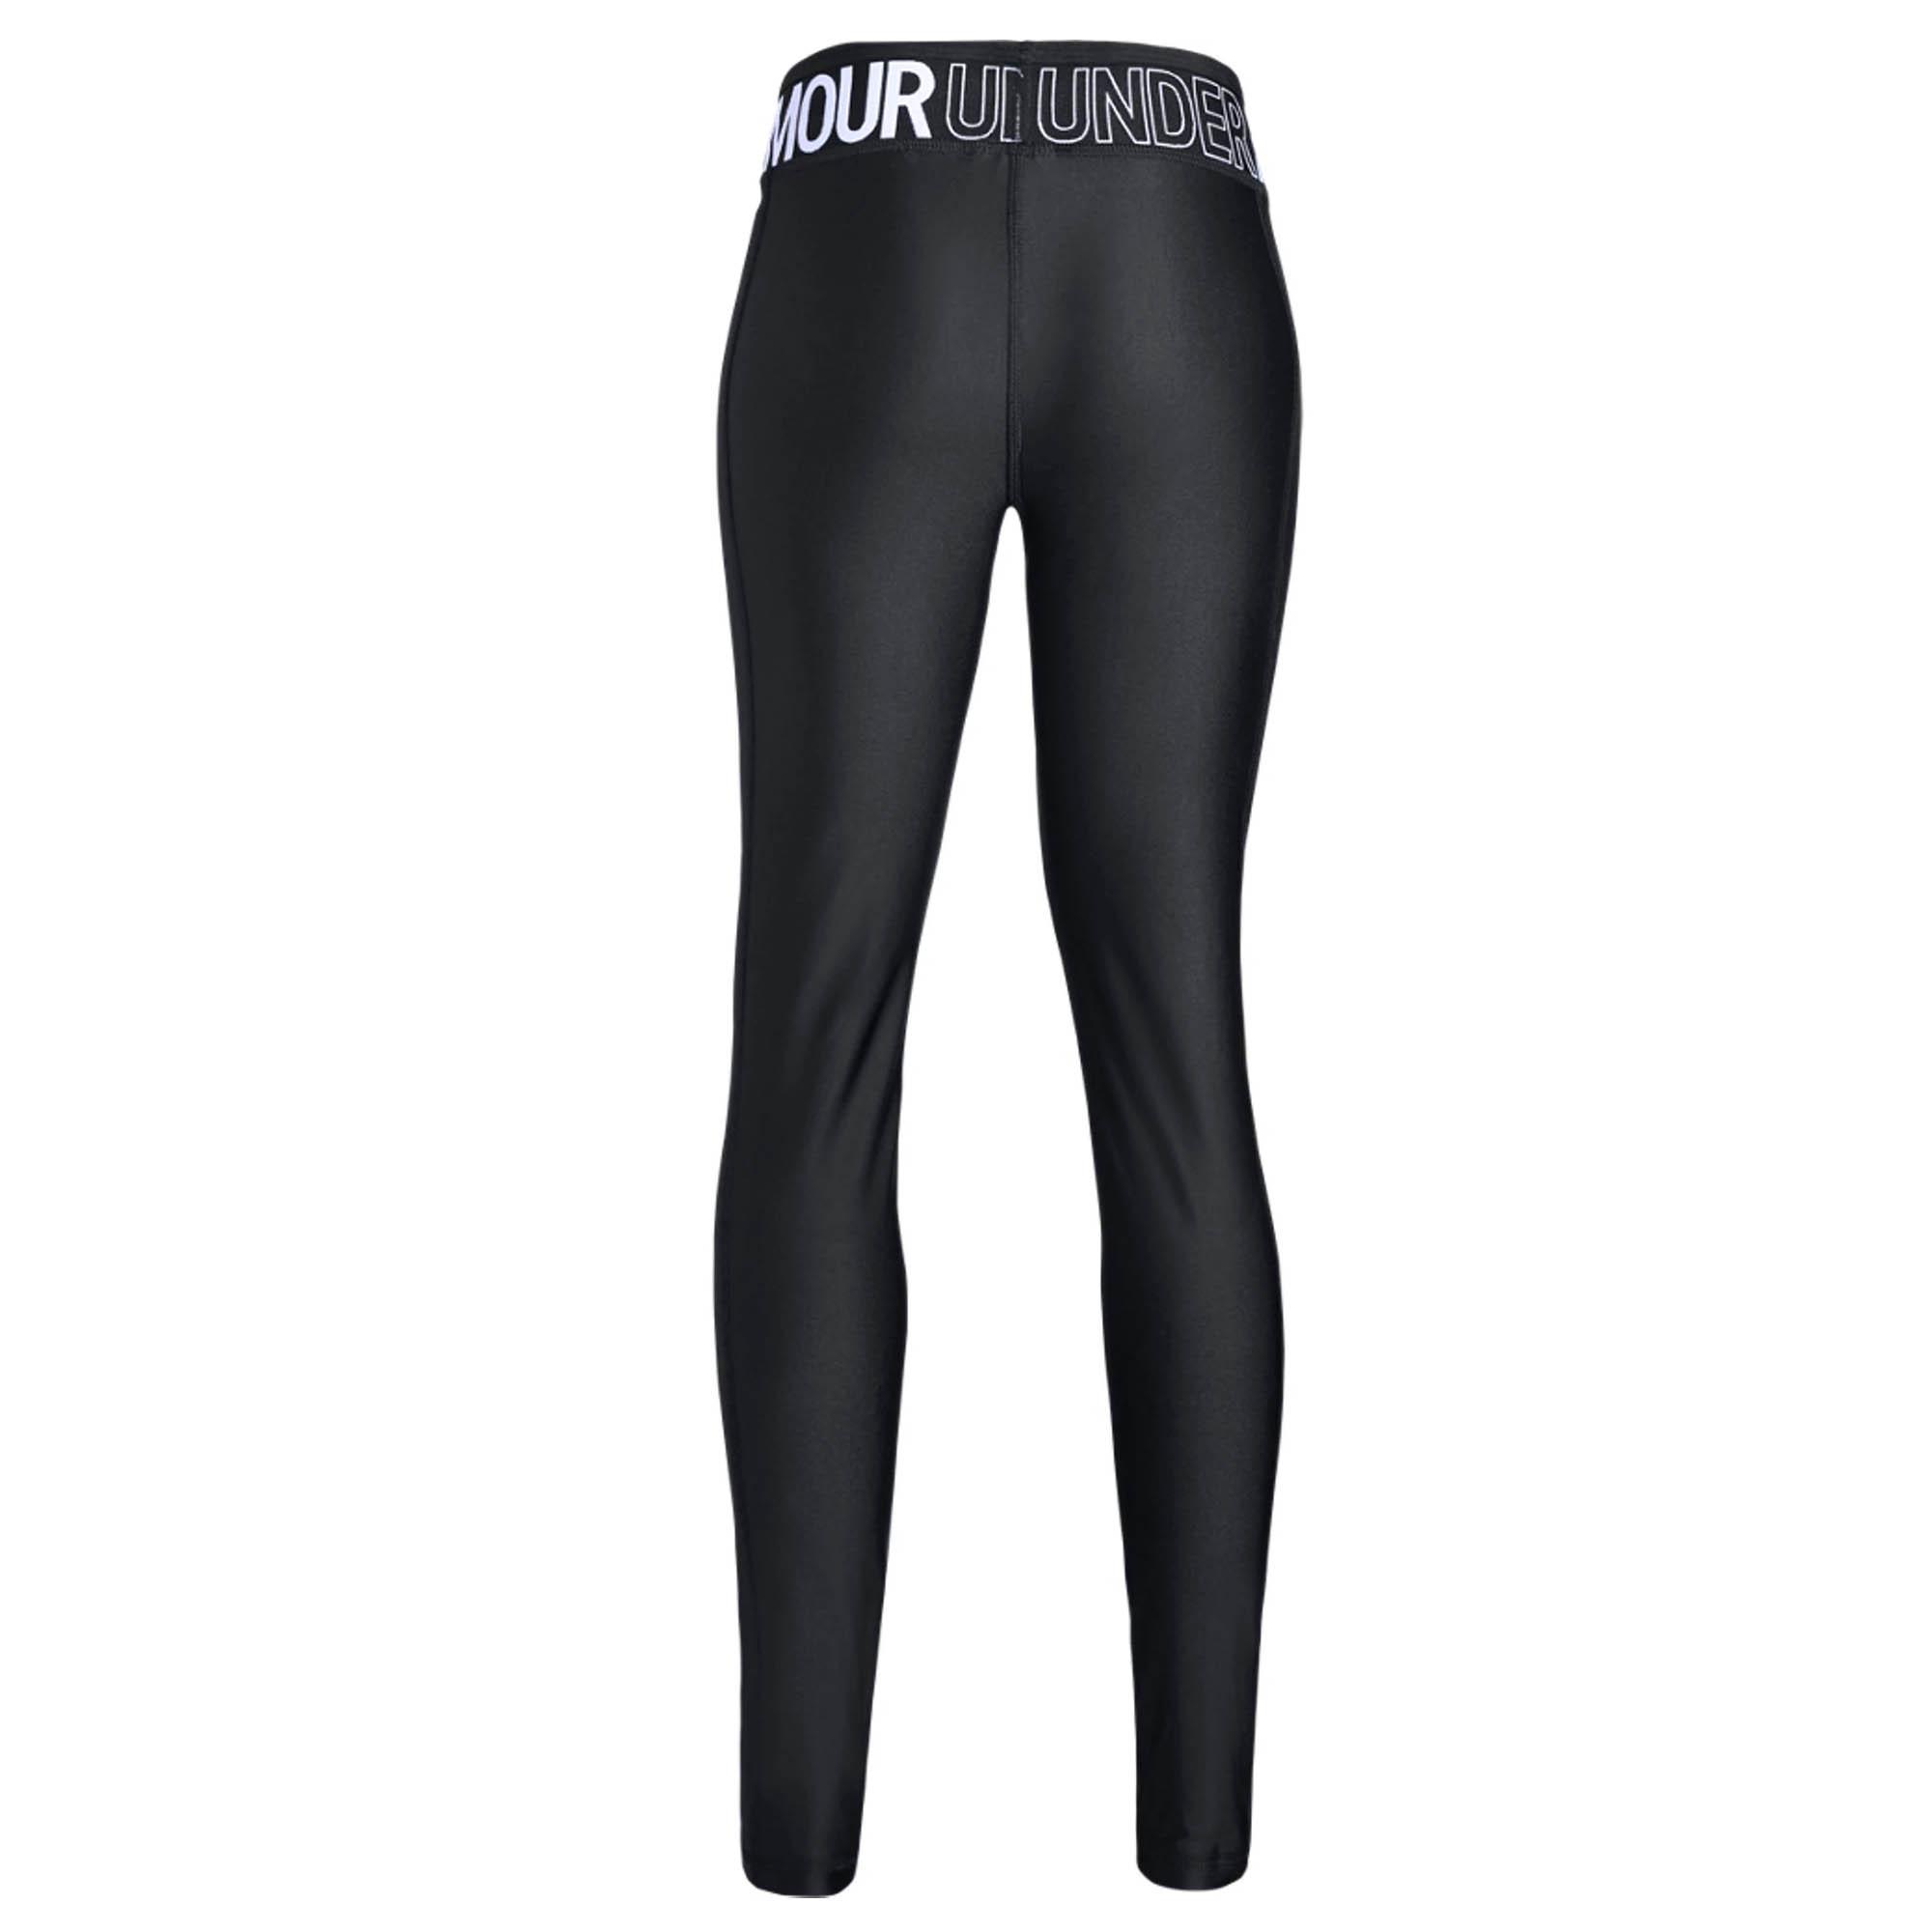 420c0eec986dc Under Armour Heatgear Armour Logo Girls Fitted Baselayer Legging ...